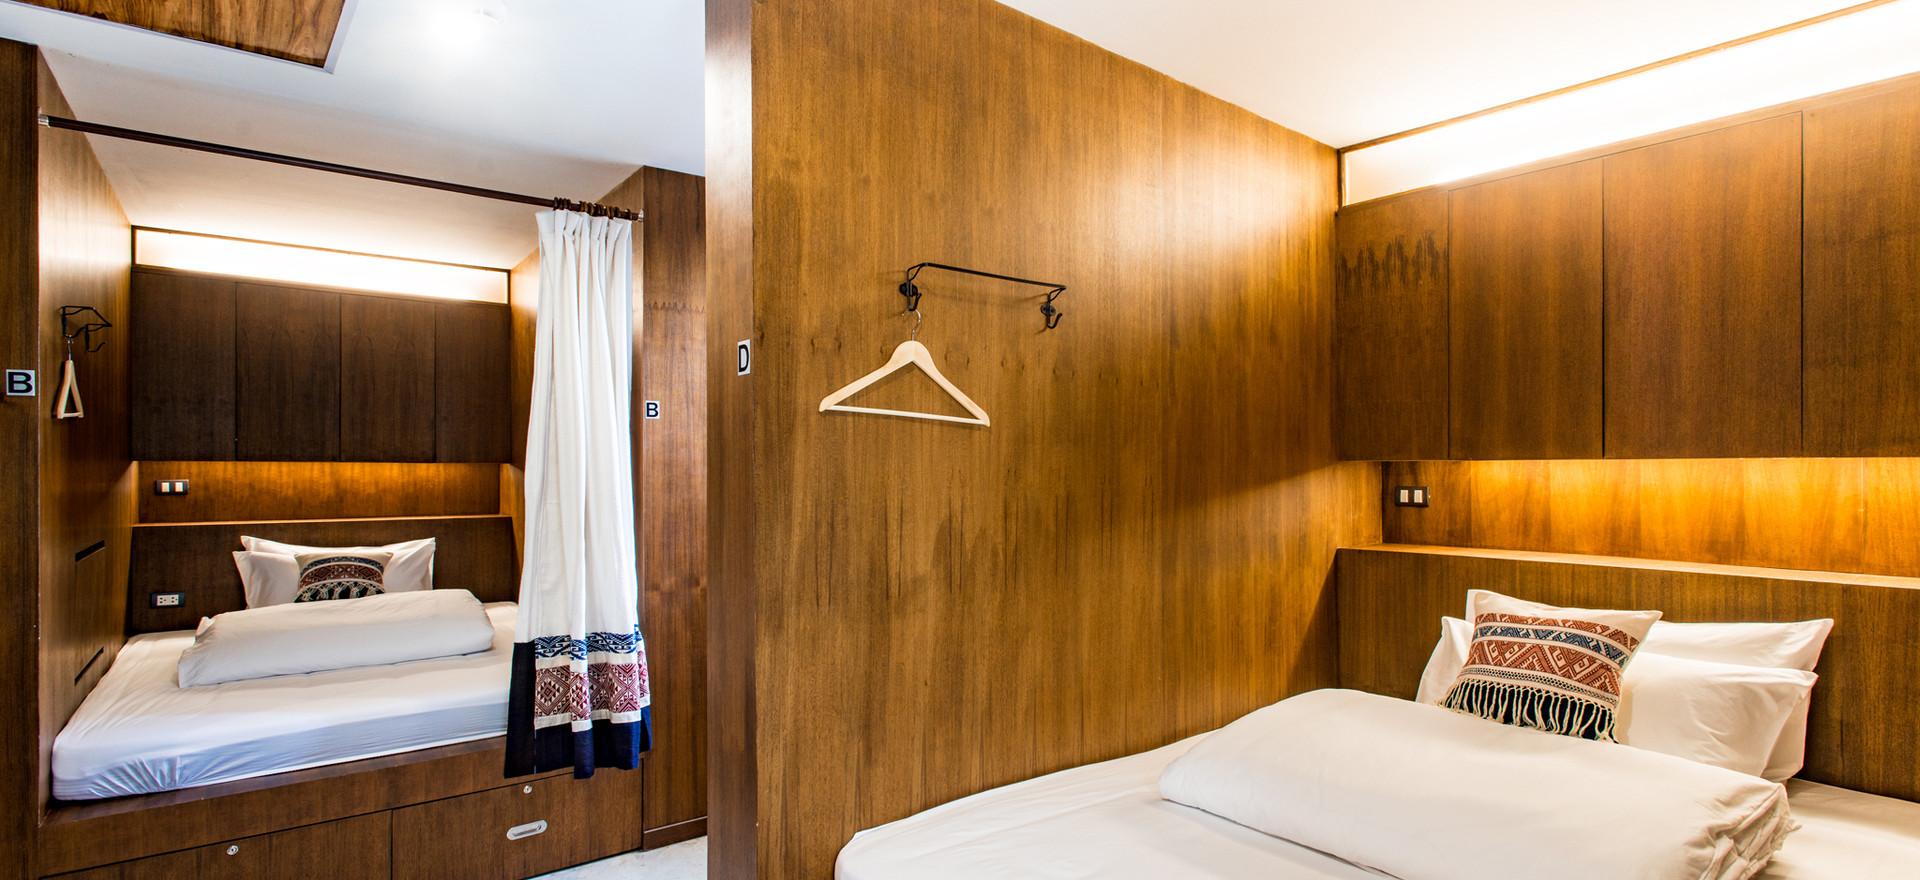 5 Beds Queen Sized Mixed Dorm